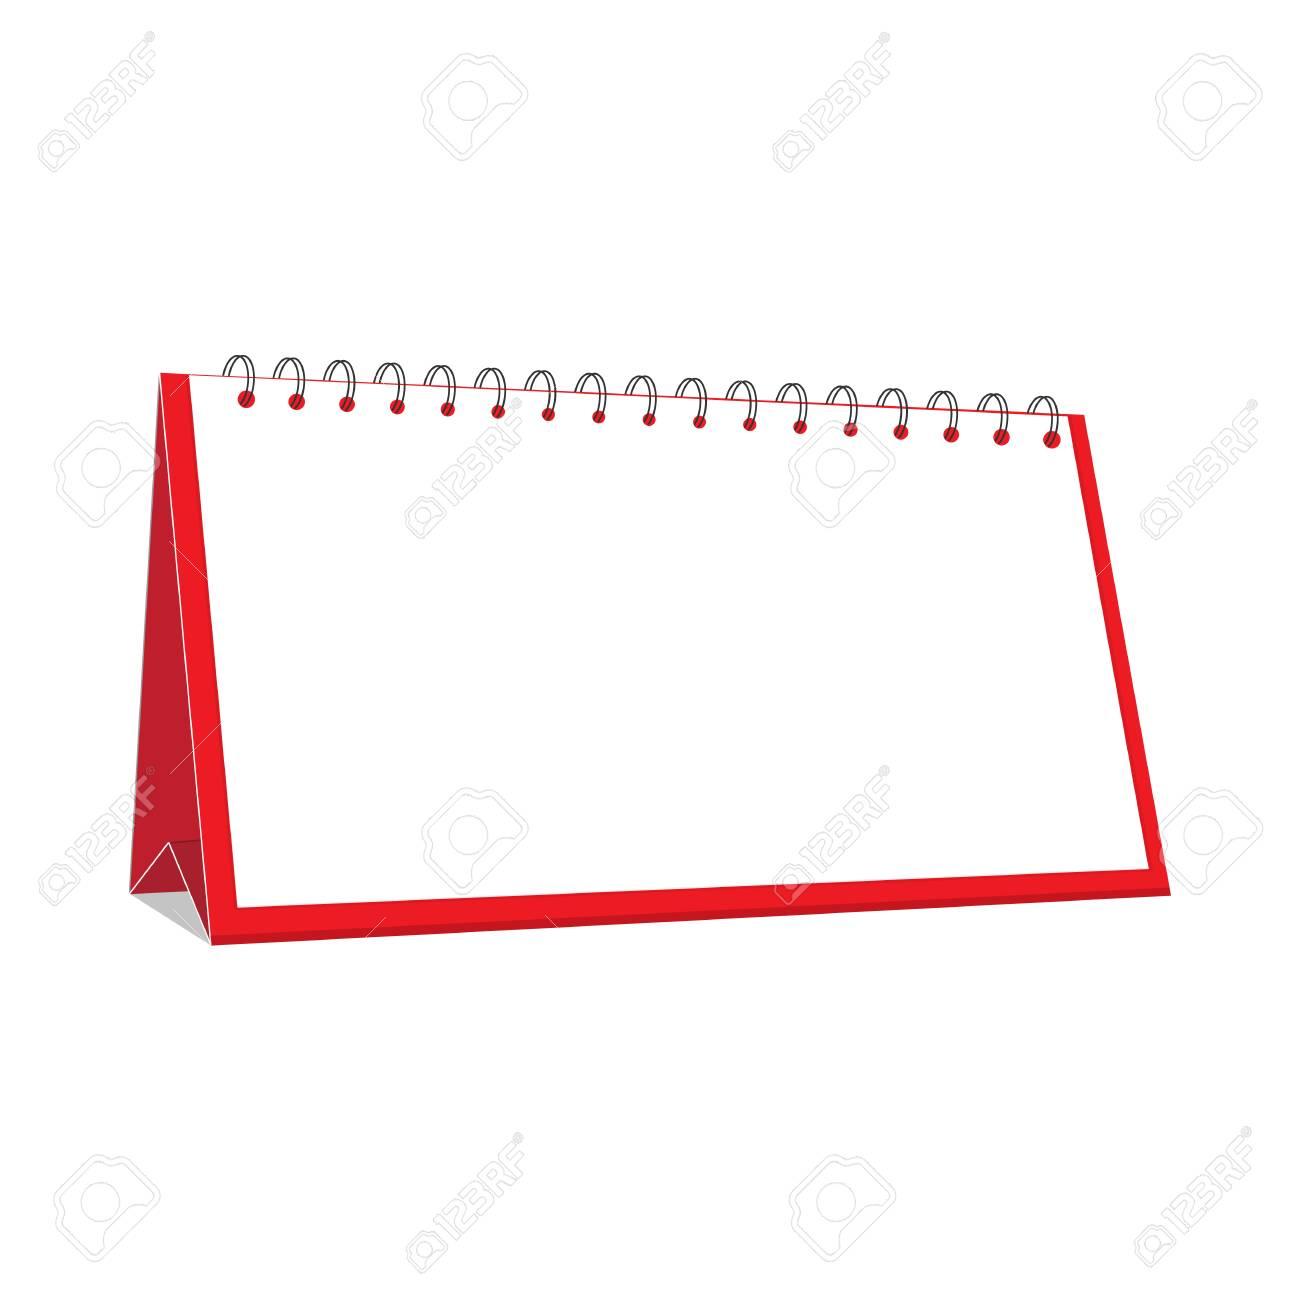 Red Blank Desktop Calendar Isolated On White Background. Office ...